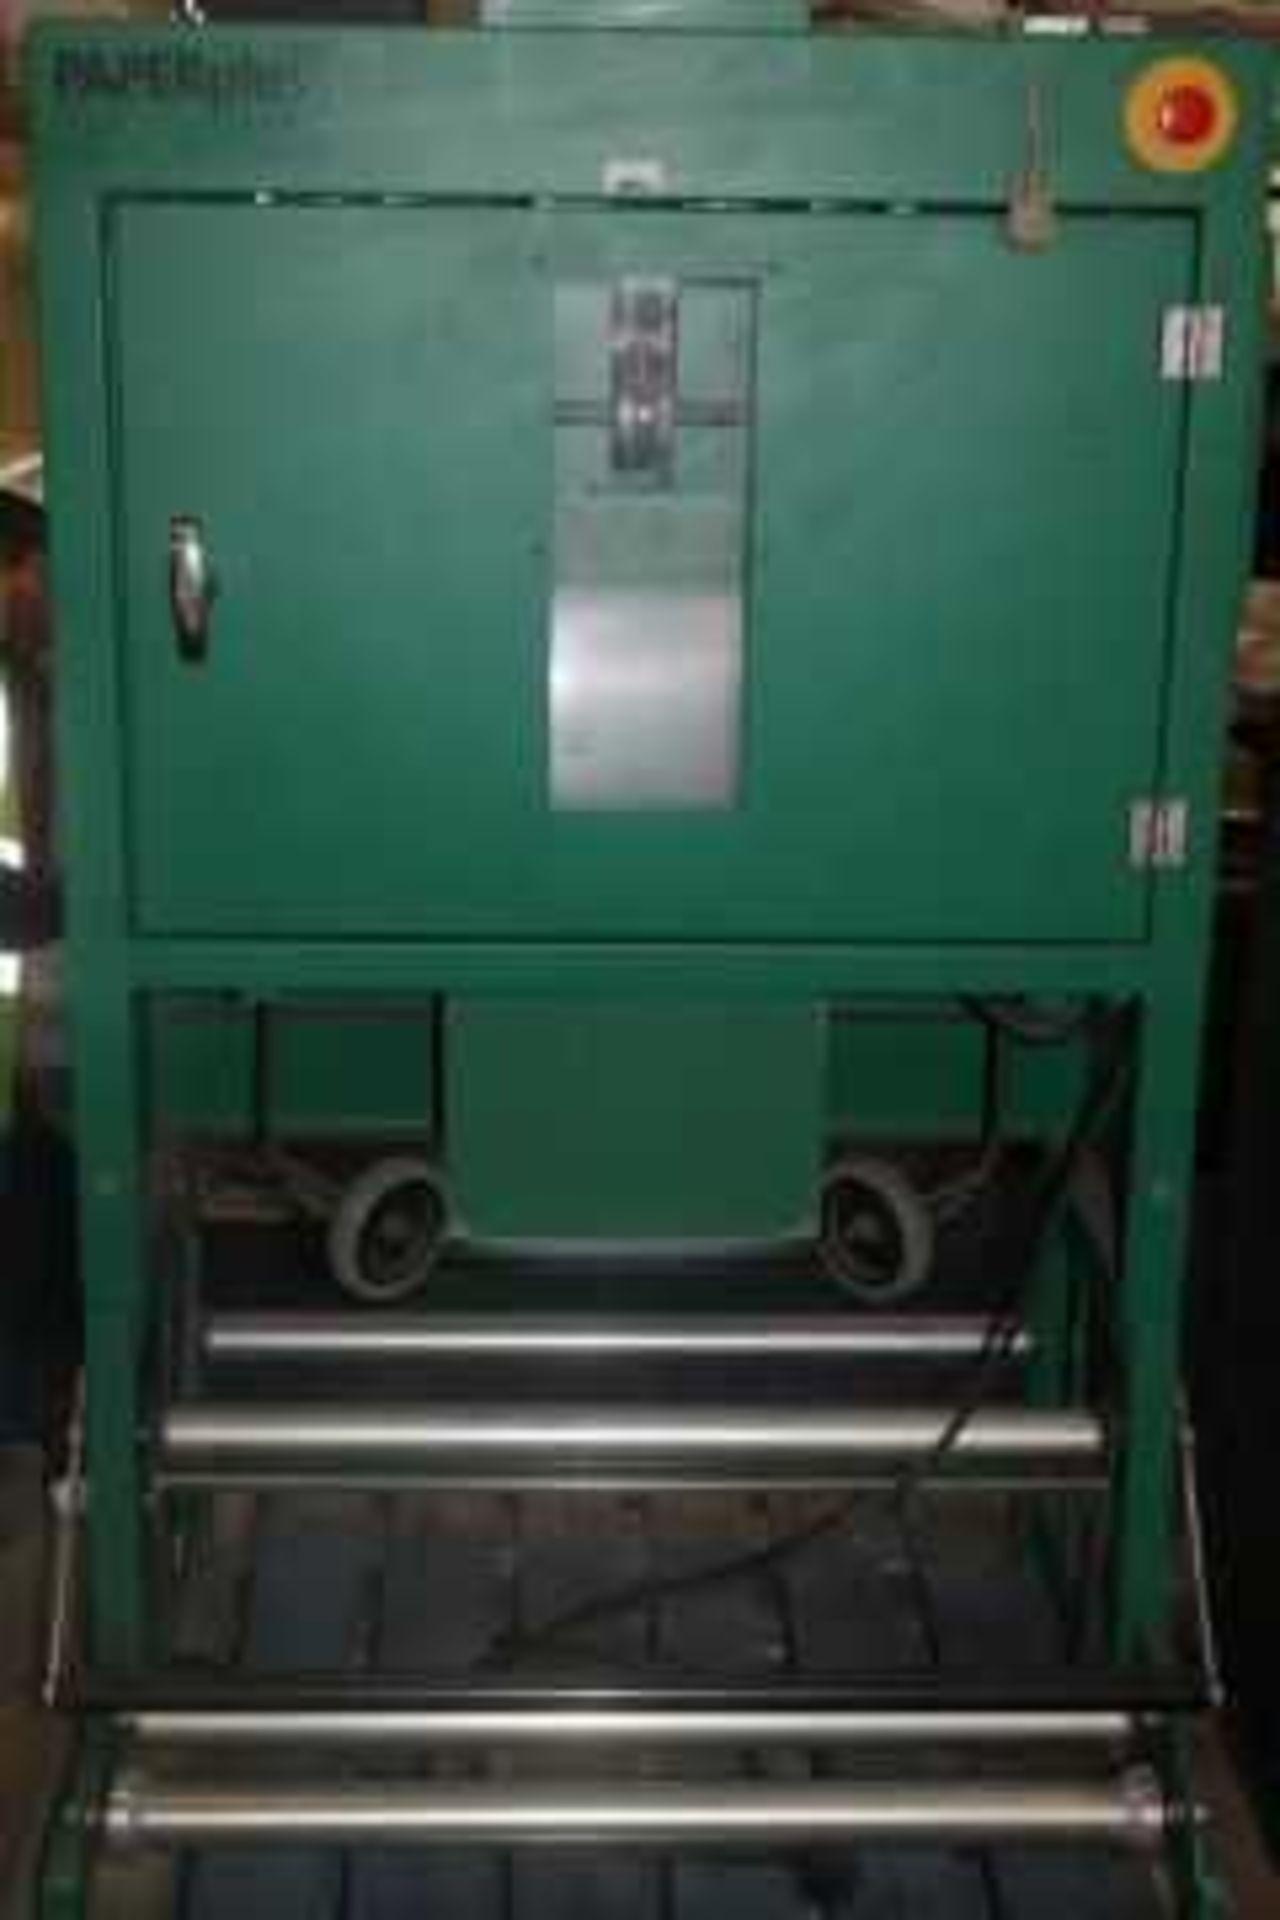 Story Pack Paper Plus Machine Efb2/G90F/4Ek71Bx-4 Paper Maker Rrp £5,000 (Appraisals Available